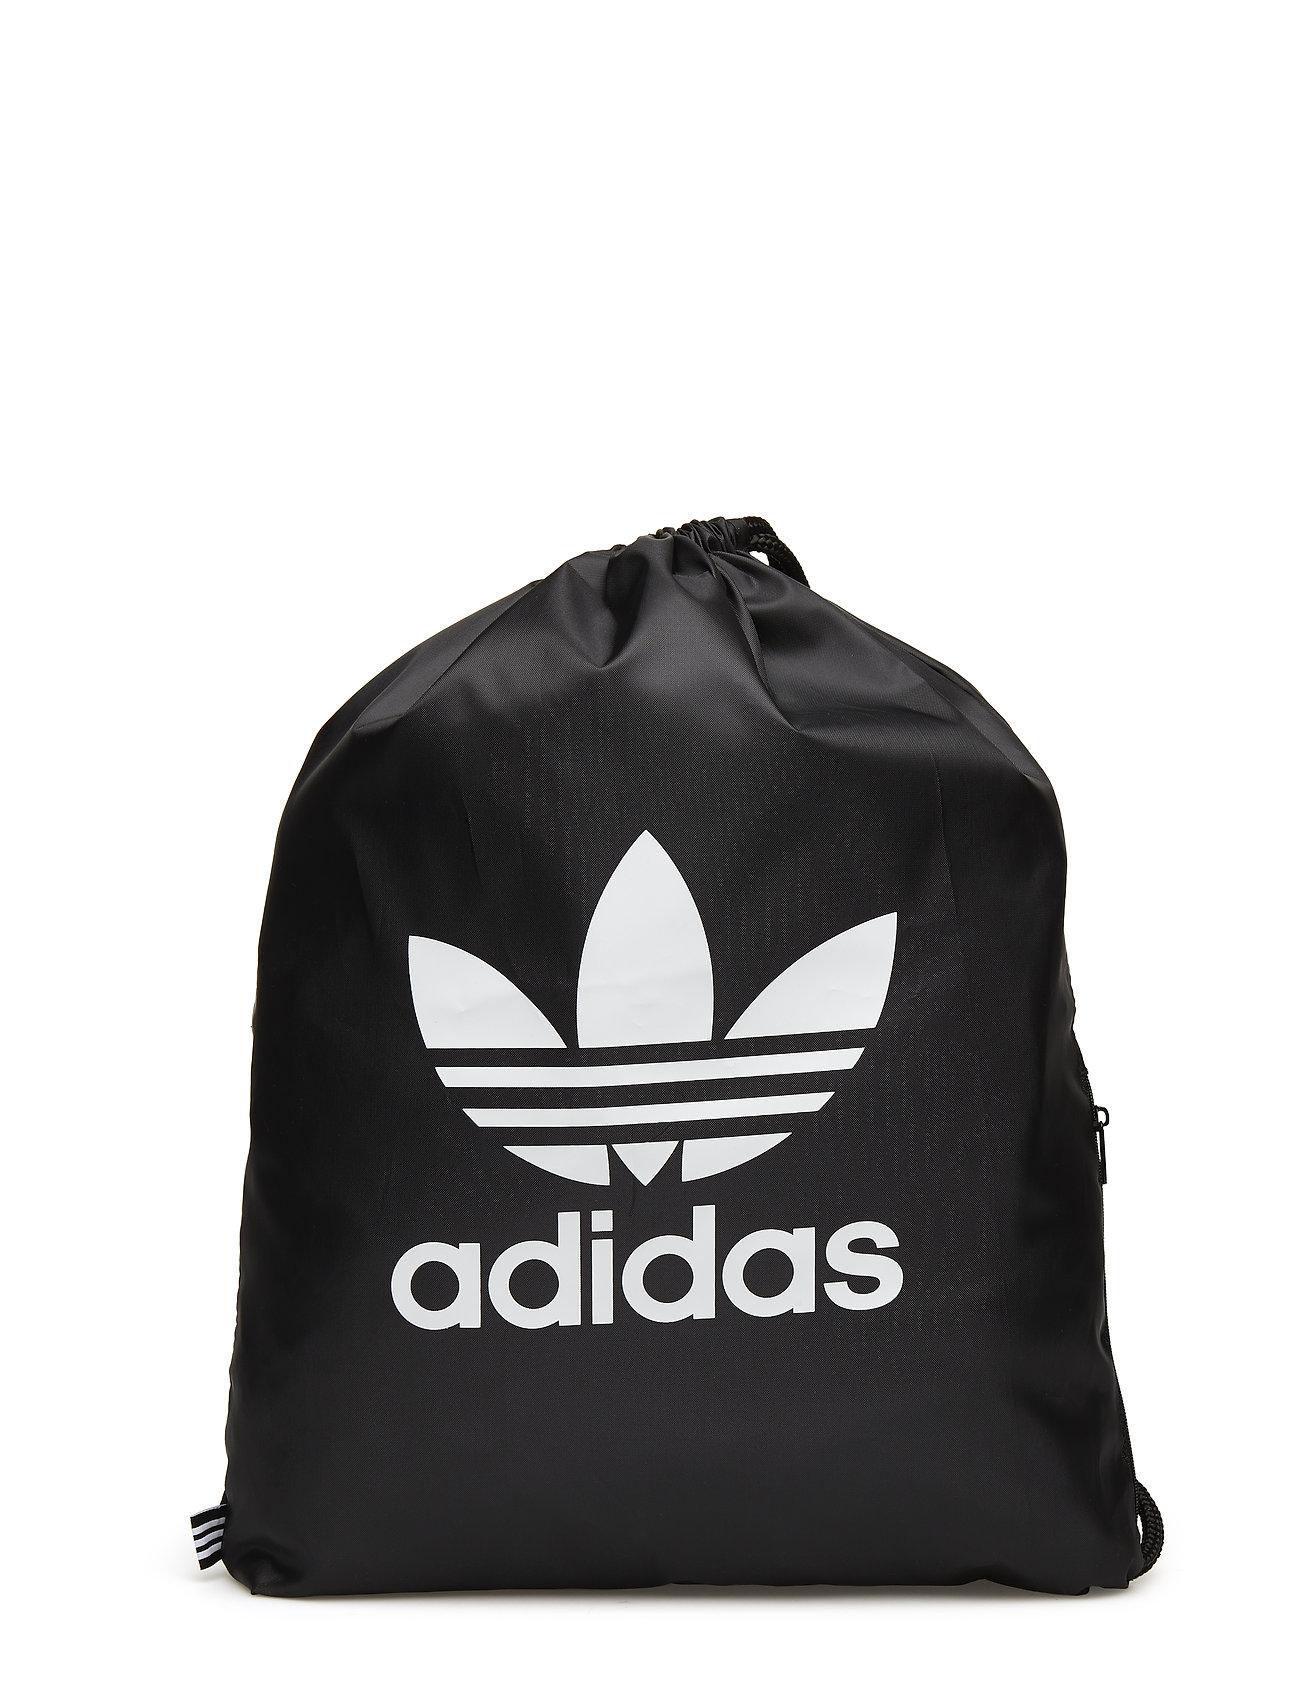 adidas Originals GYMSACK TREFOIL - BLACK